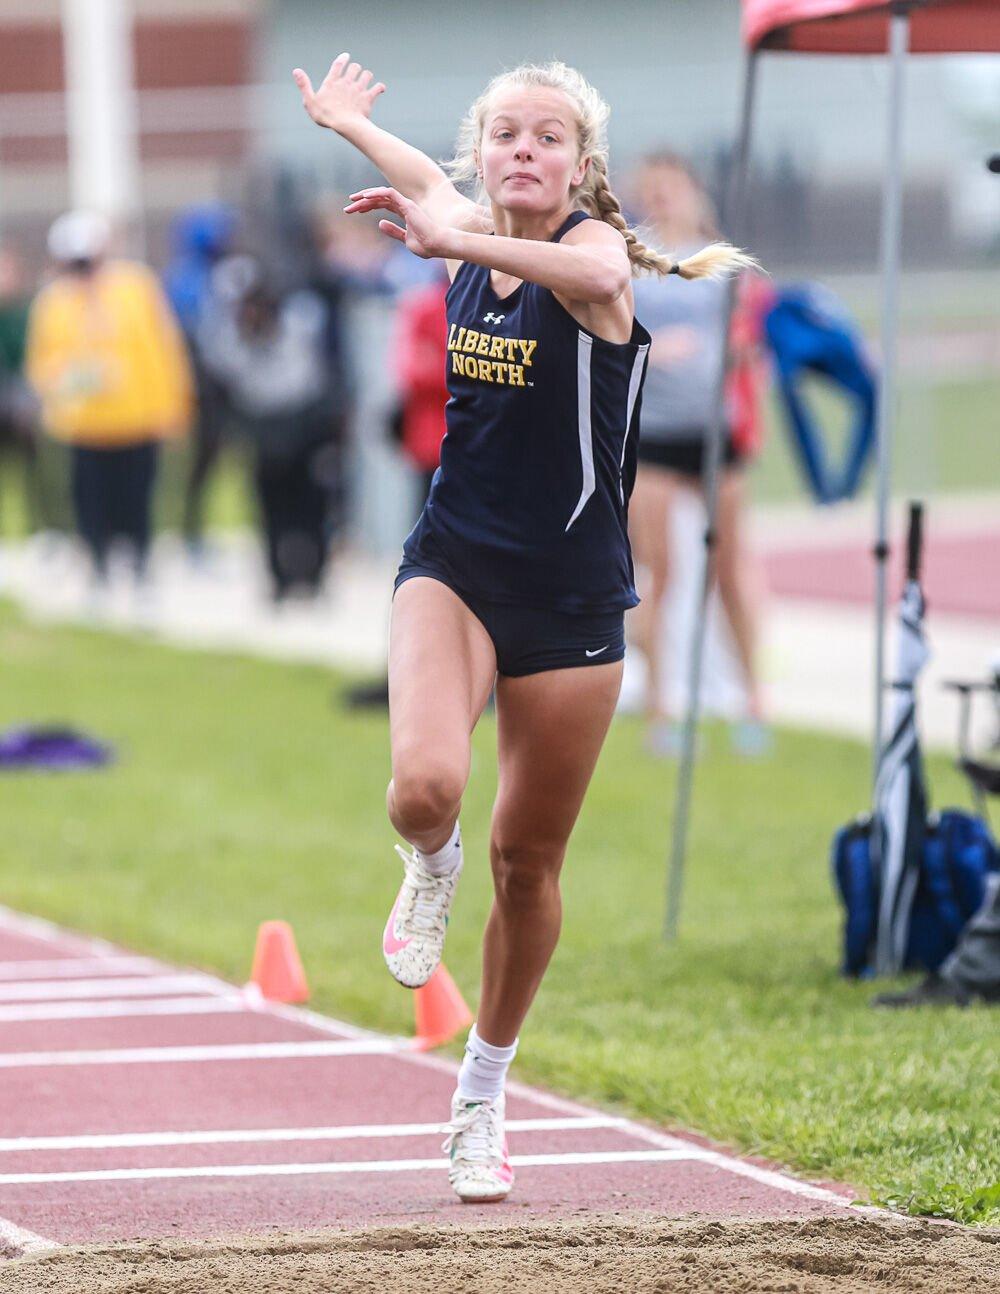 Liberty North Girls Athlete of the Year: Rachel Spainhour